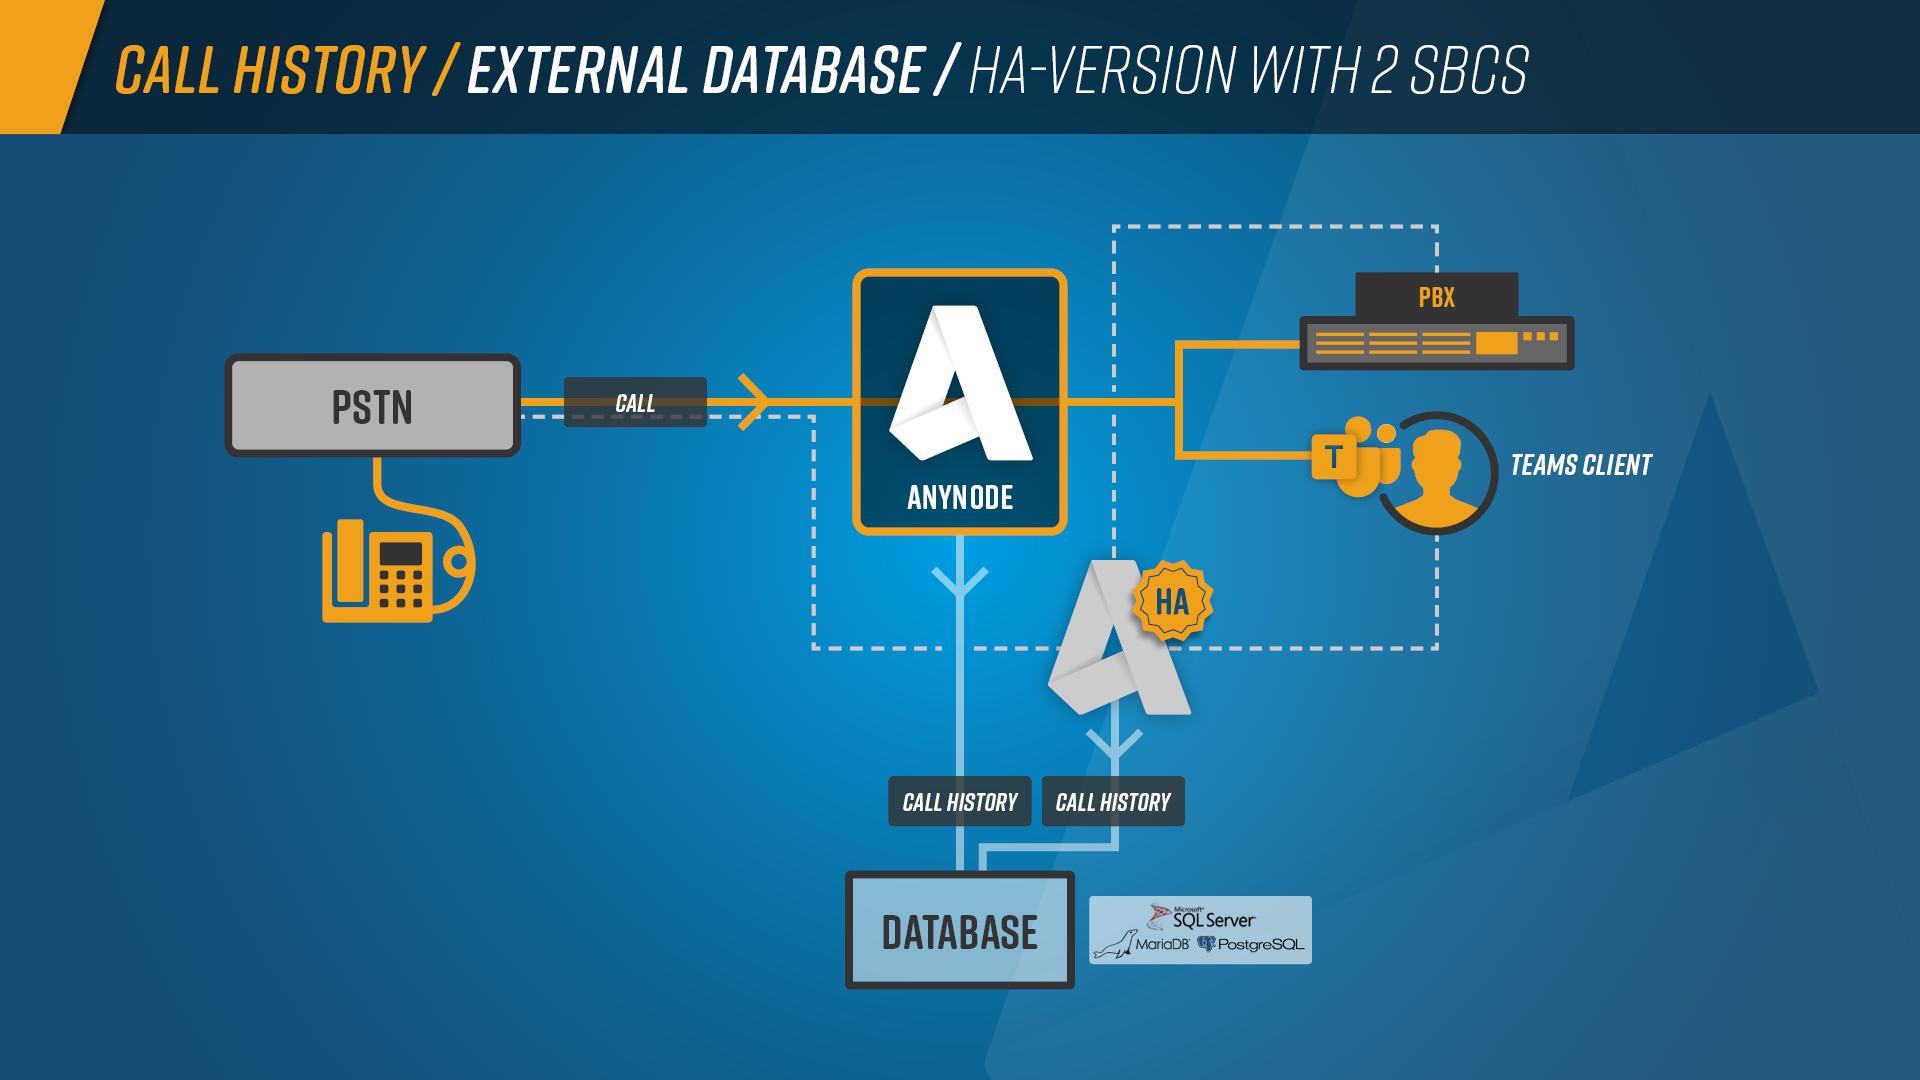 Call_History_Graph_External_Database_HA_Version_2SBCs